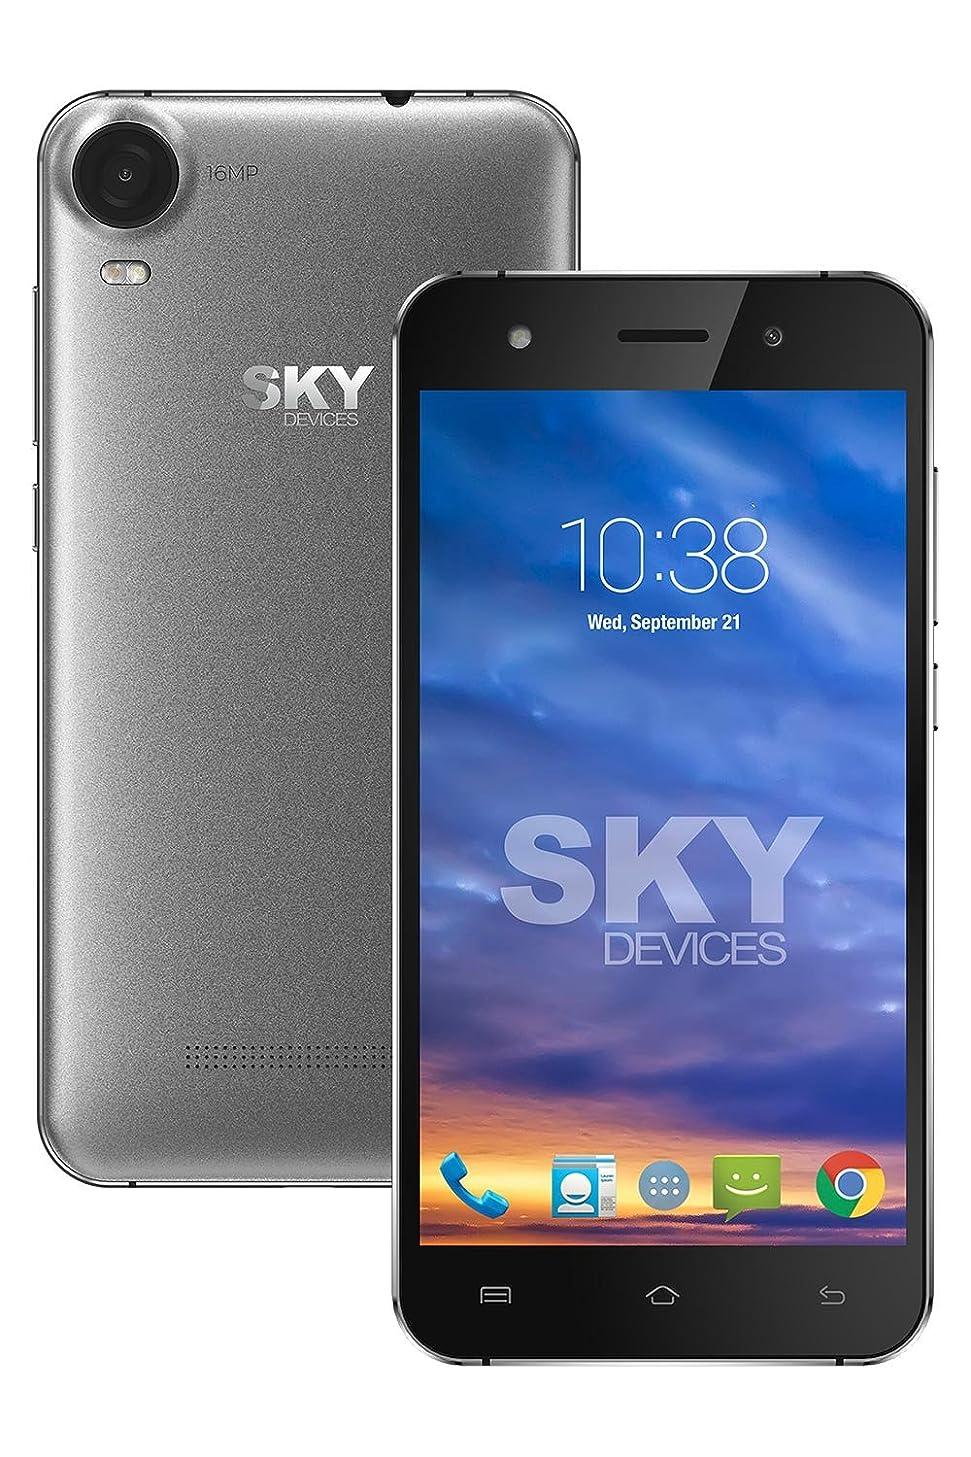 SKY DEVICES Elite PhotoPro Factory Unlocked Phone - 5